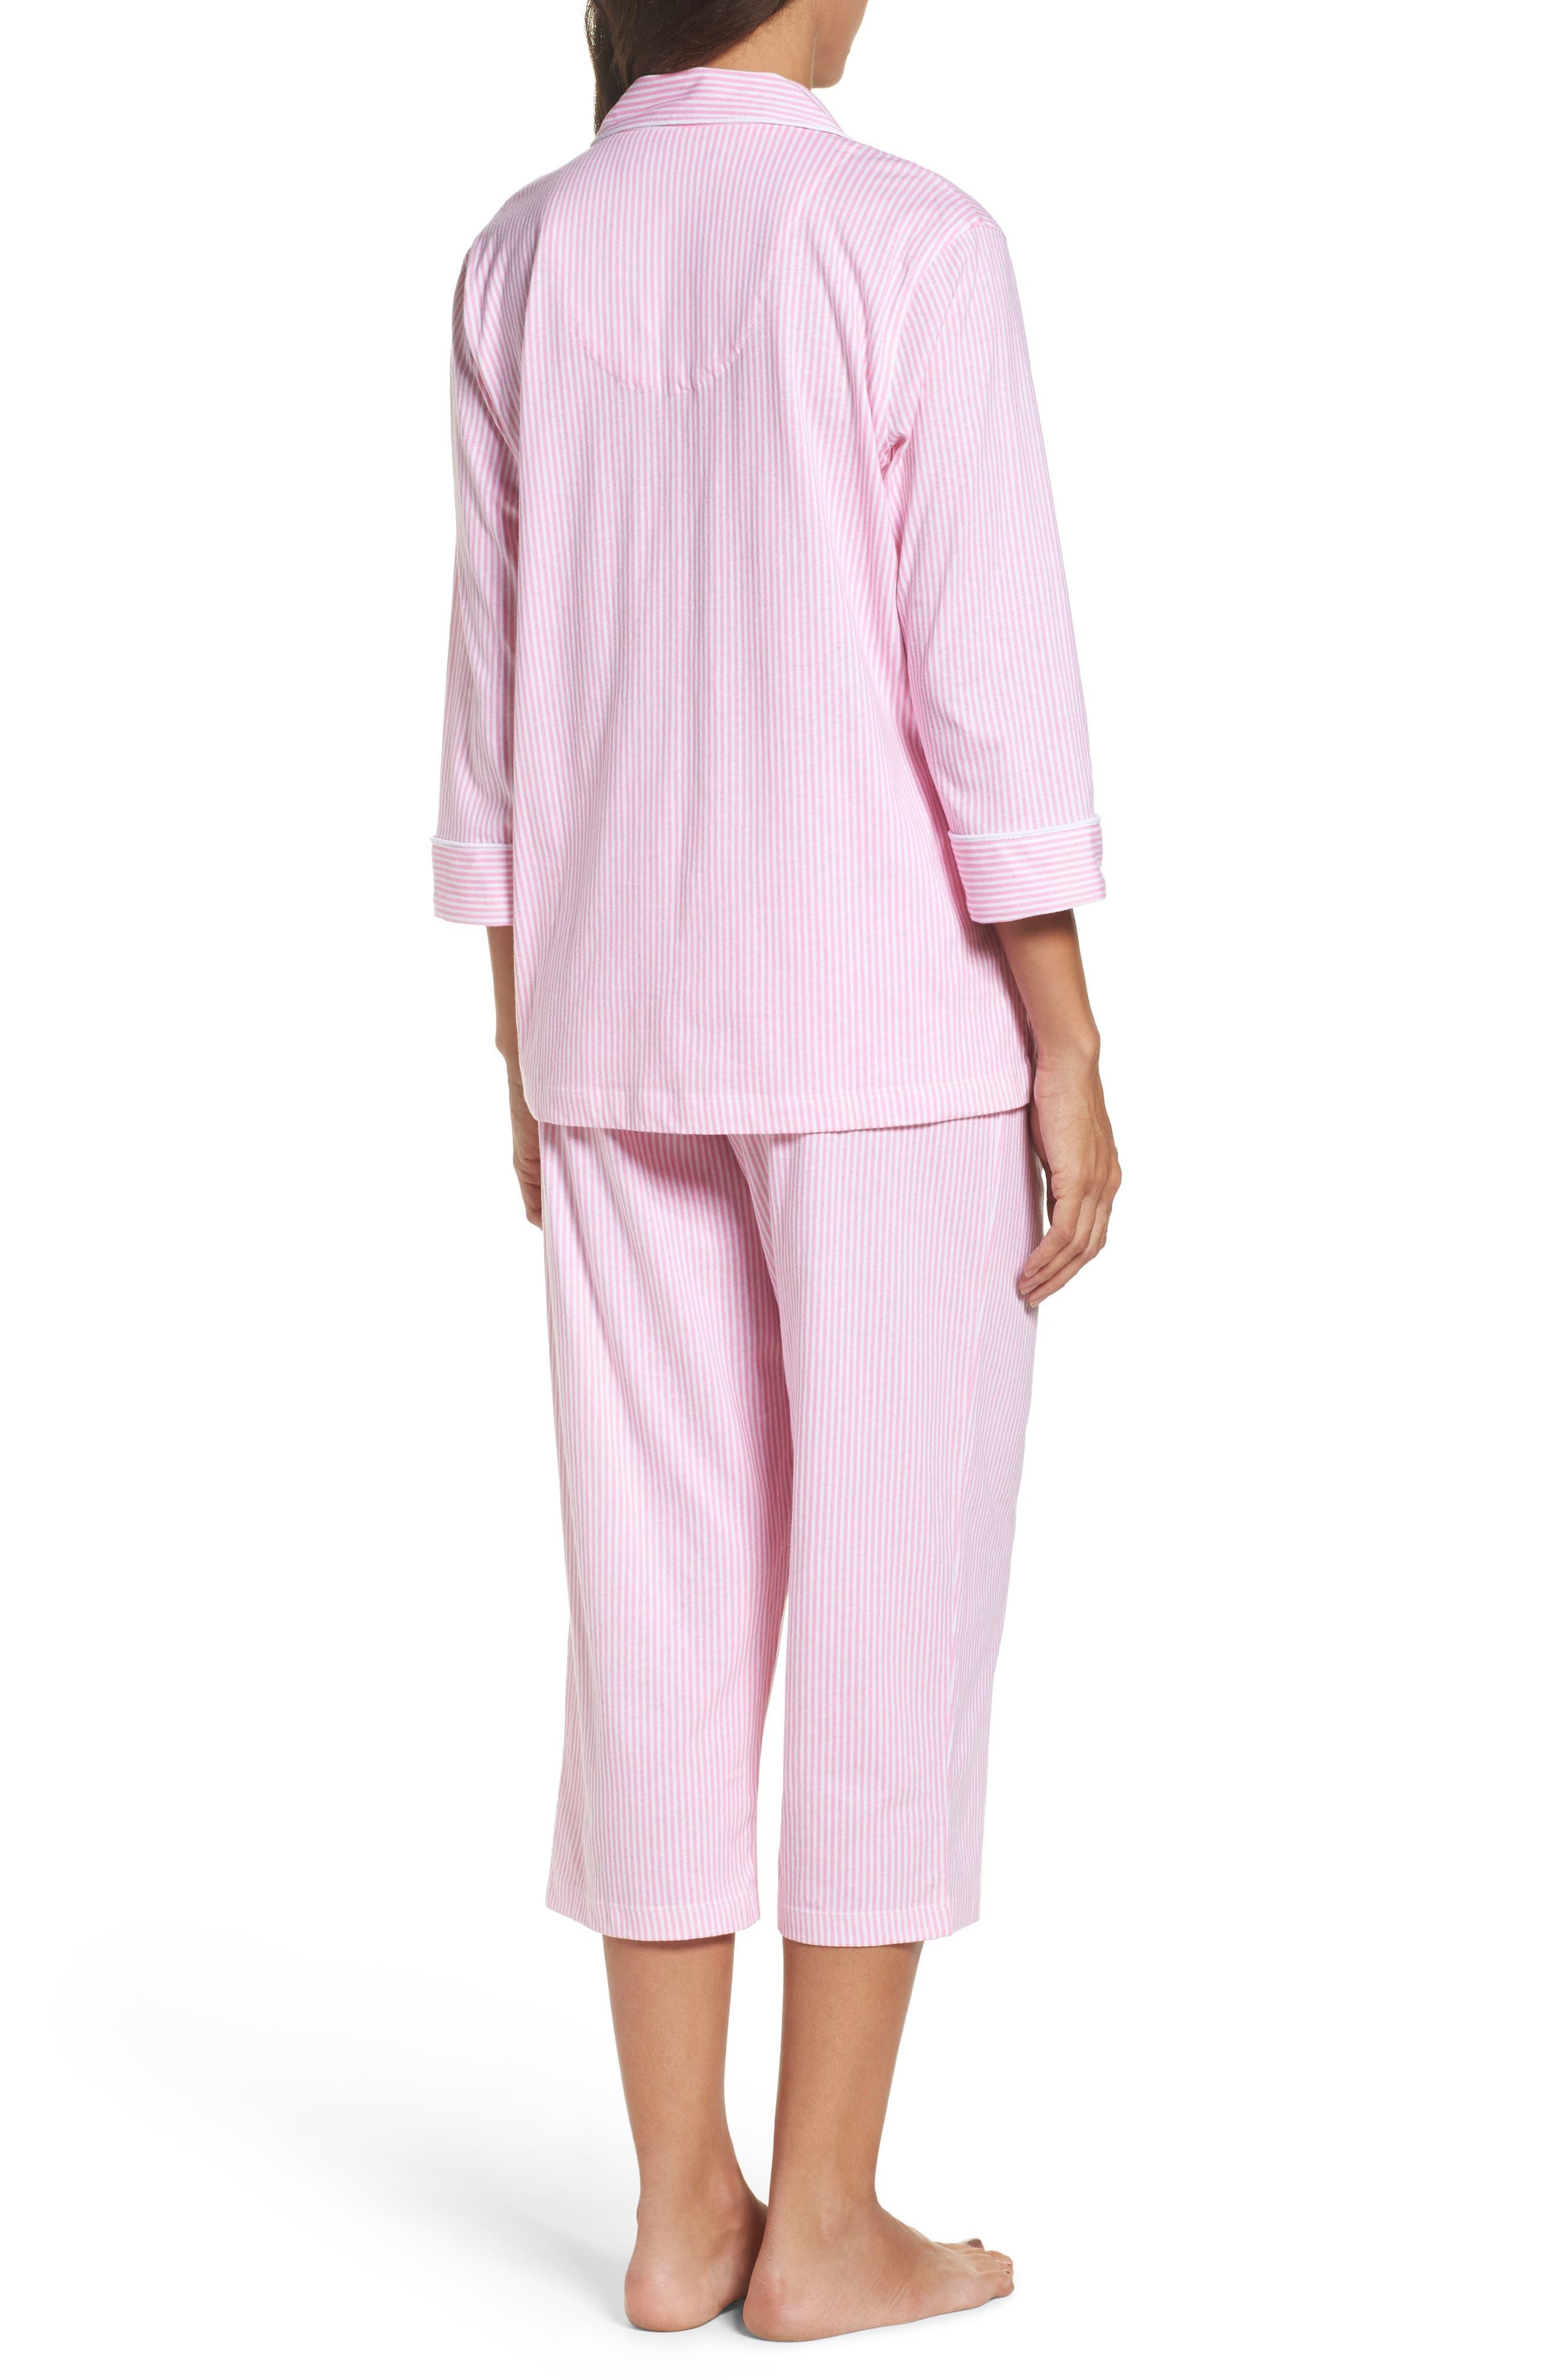 Knit Crop Pajamas,                             Alternate thumbnail 2, color,                             Lagoon Pink/ White Stripe